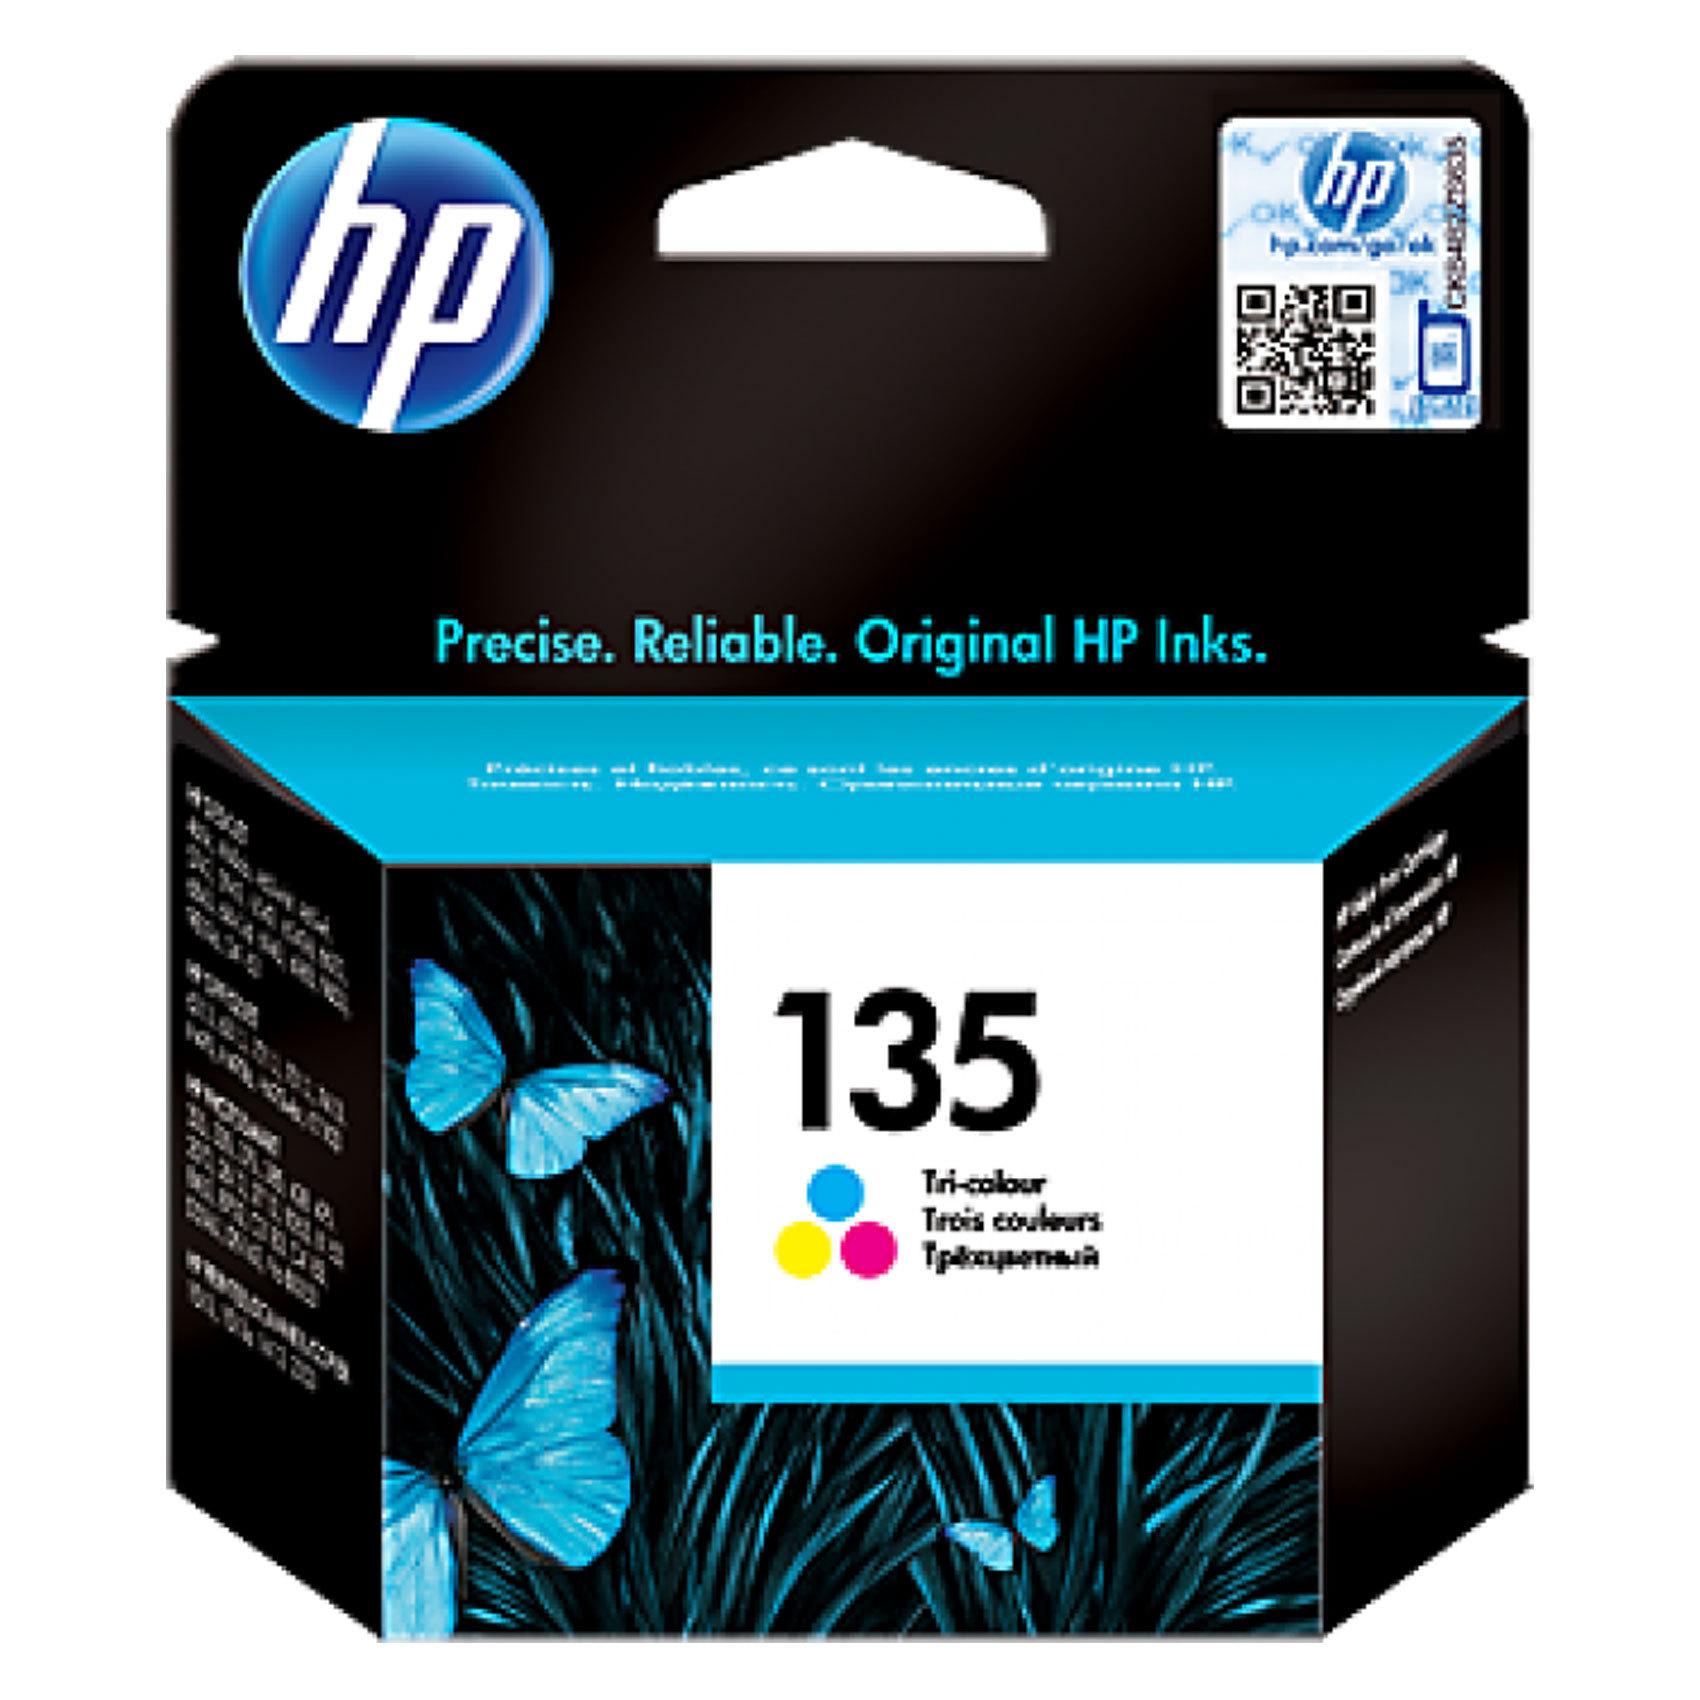 HP CART 135 TRICOLOR IJ 7ML